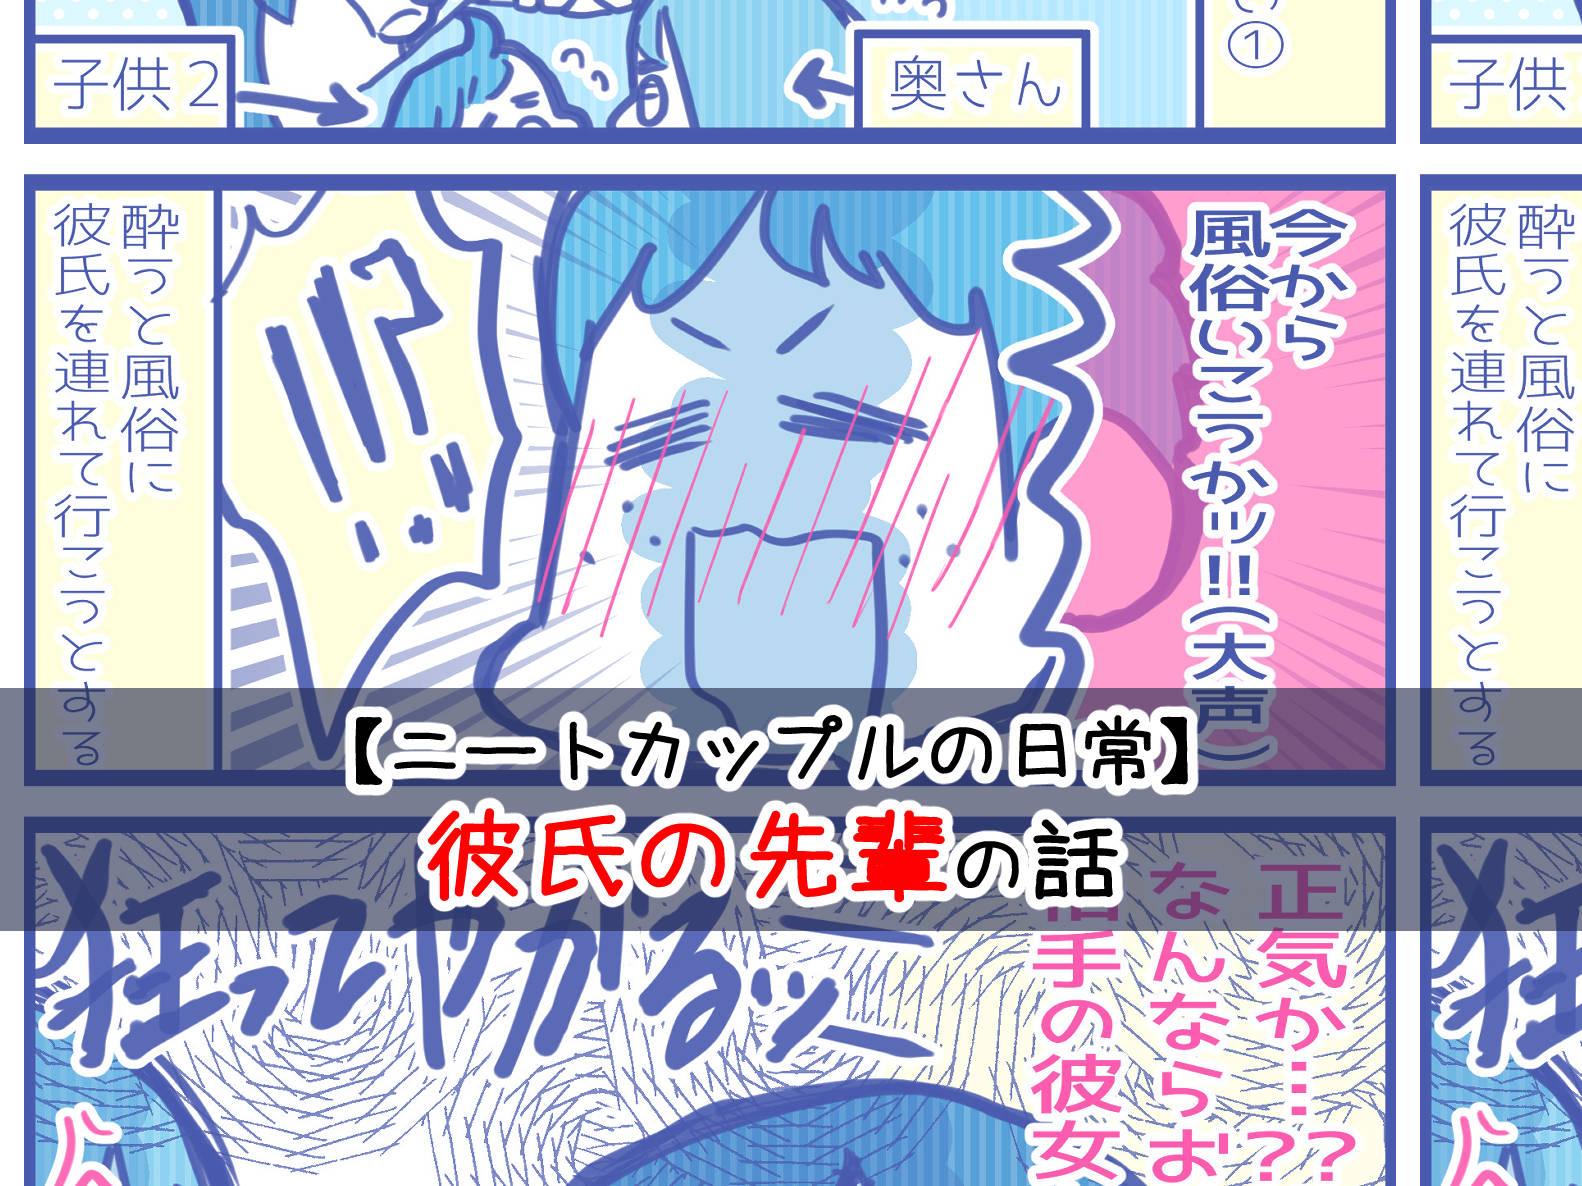 neetsadami.com_サムネ